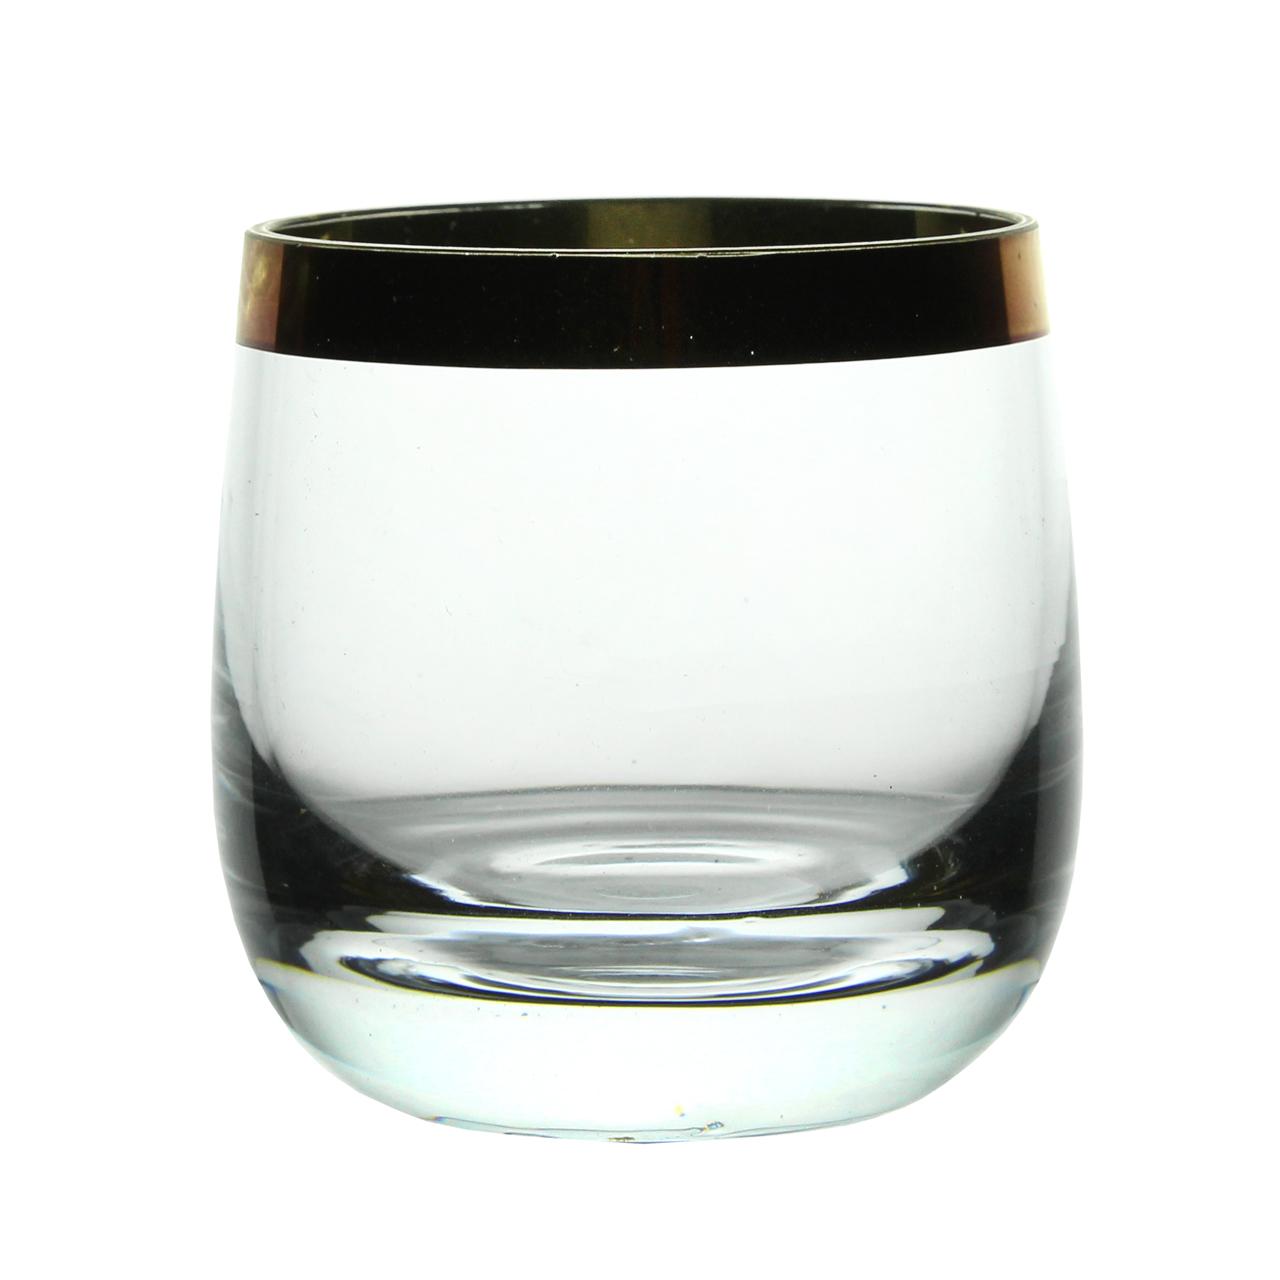 Pahar Din Sticla Cu Margine Aurie 7 Cm